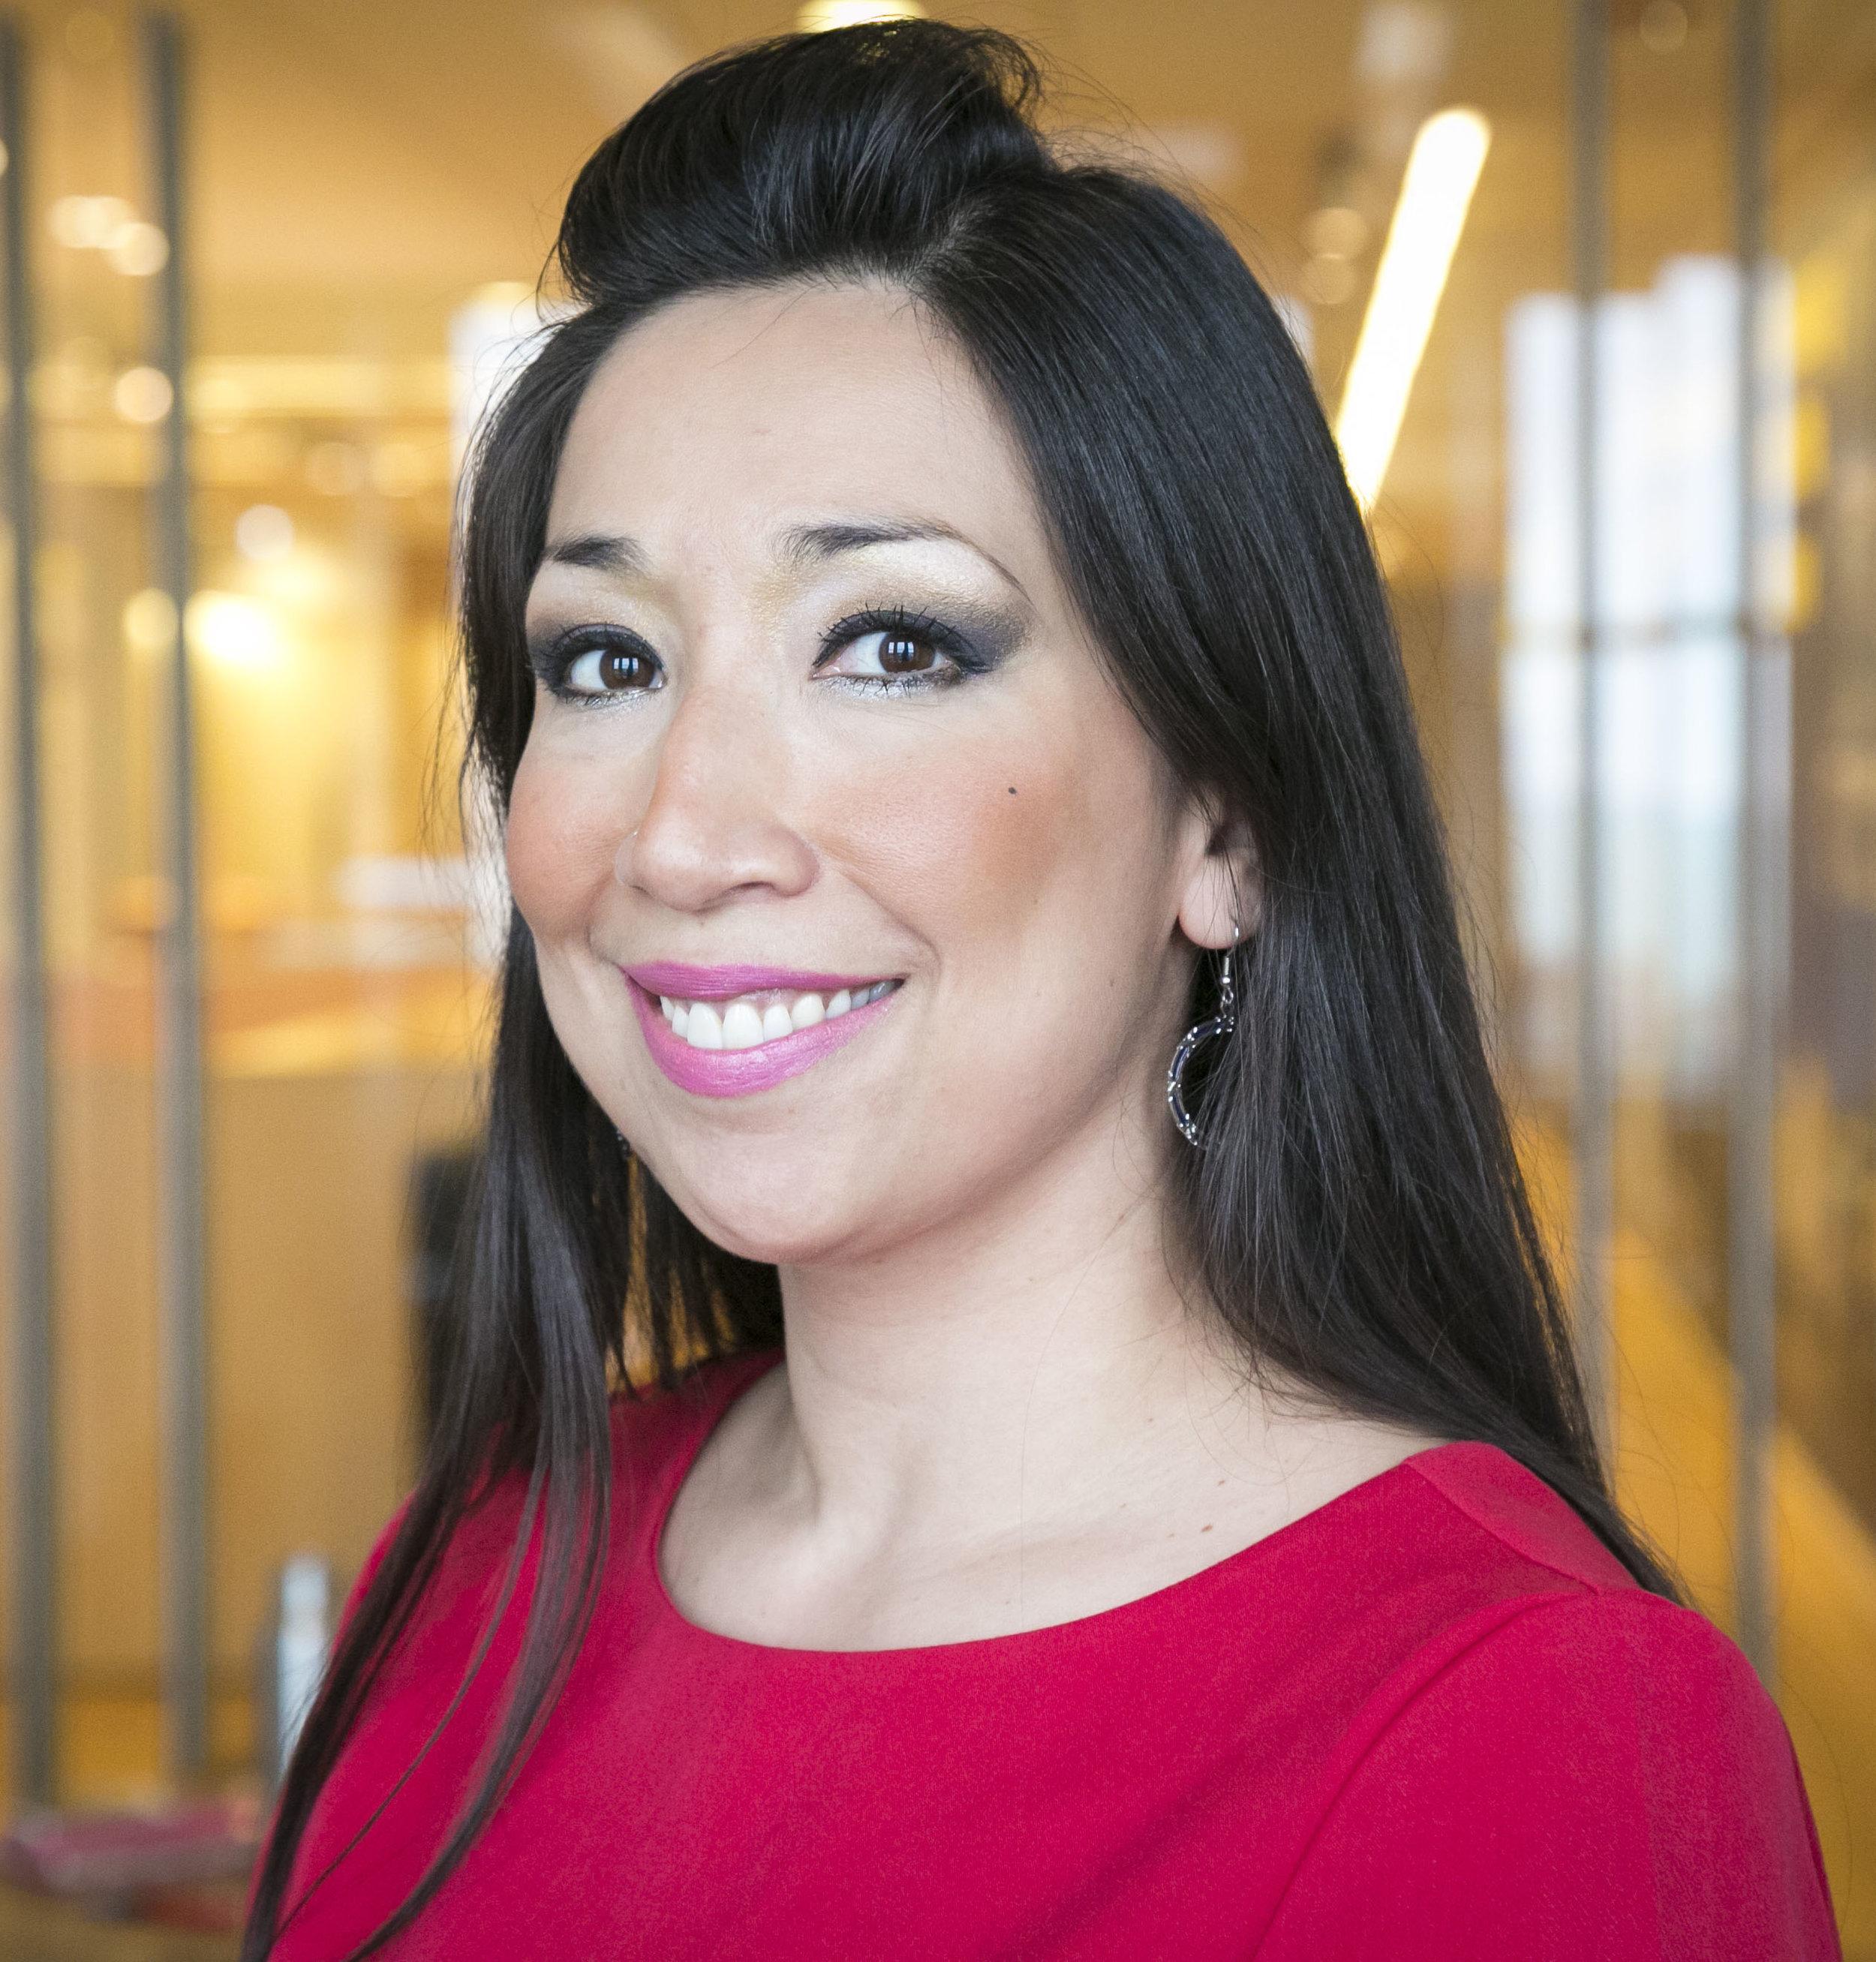 Ingedia K. Sanchez, AIA, LEED AP BD+ C, NCARB - Firm: SOM, Chicago